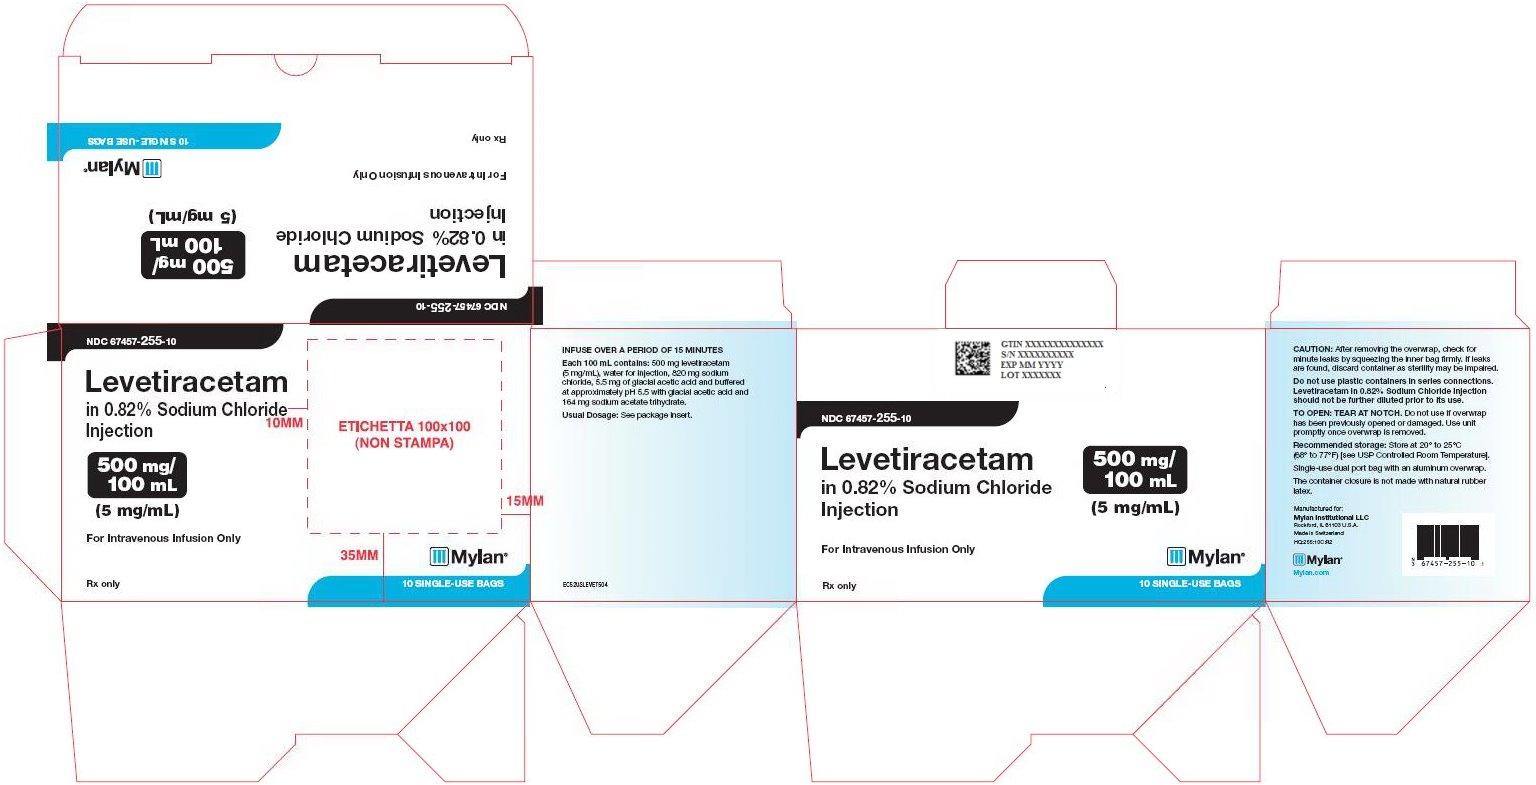 Levetiracetam Sodium Chloride Injection 500 mg/100 mL Carton Label